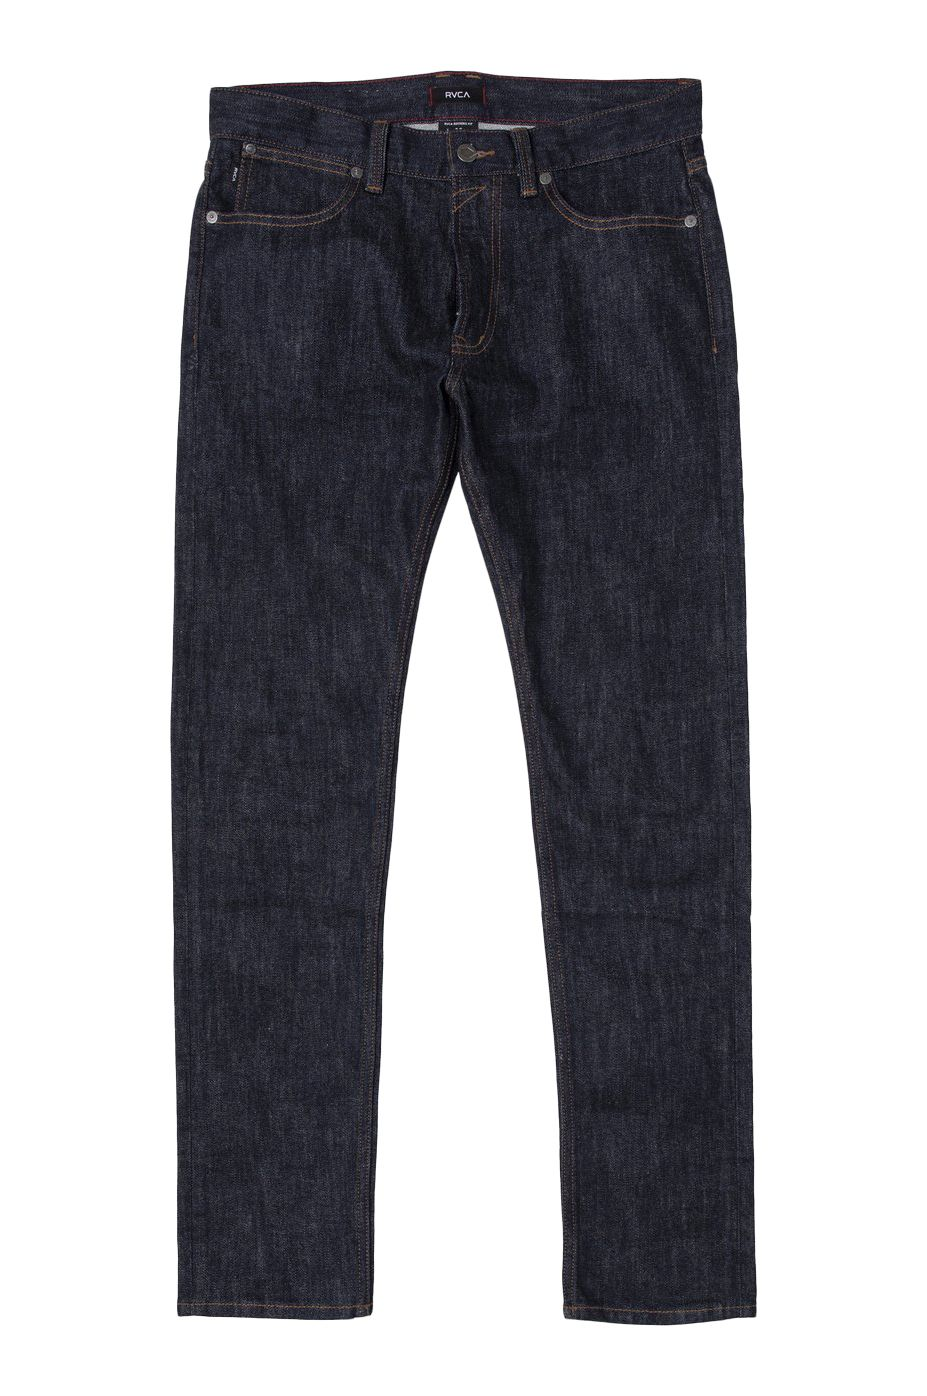 RVCA Pant Jeans RVCA ROCKERS DENIM Dark Indigo